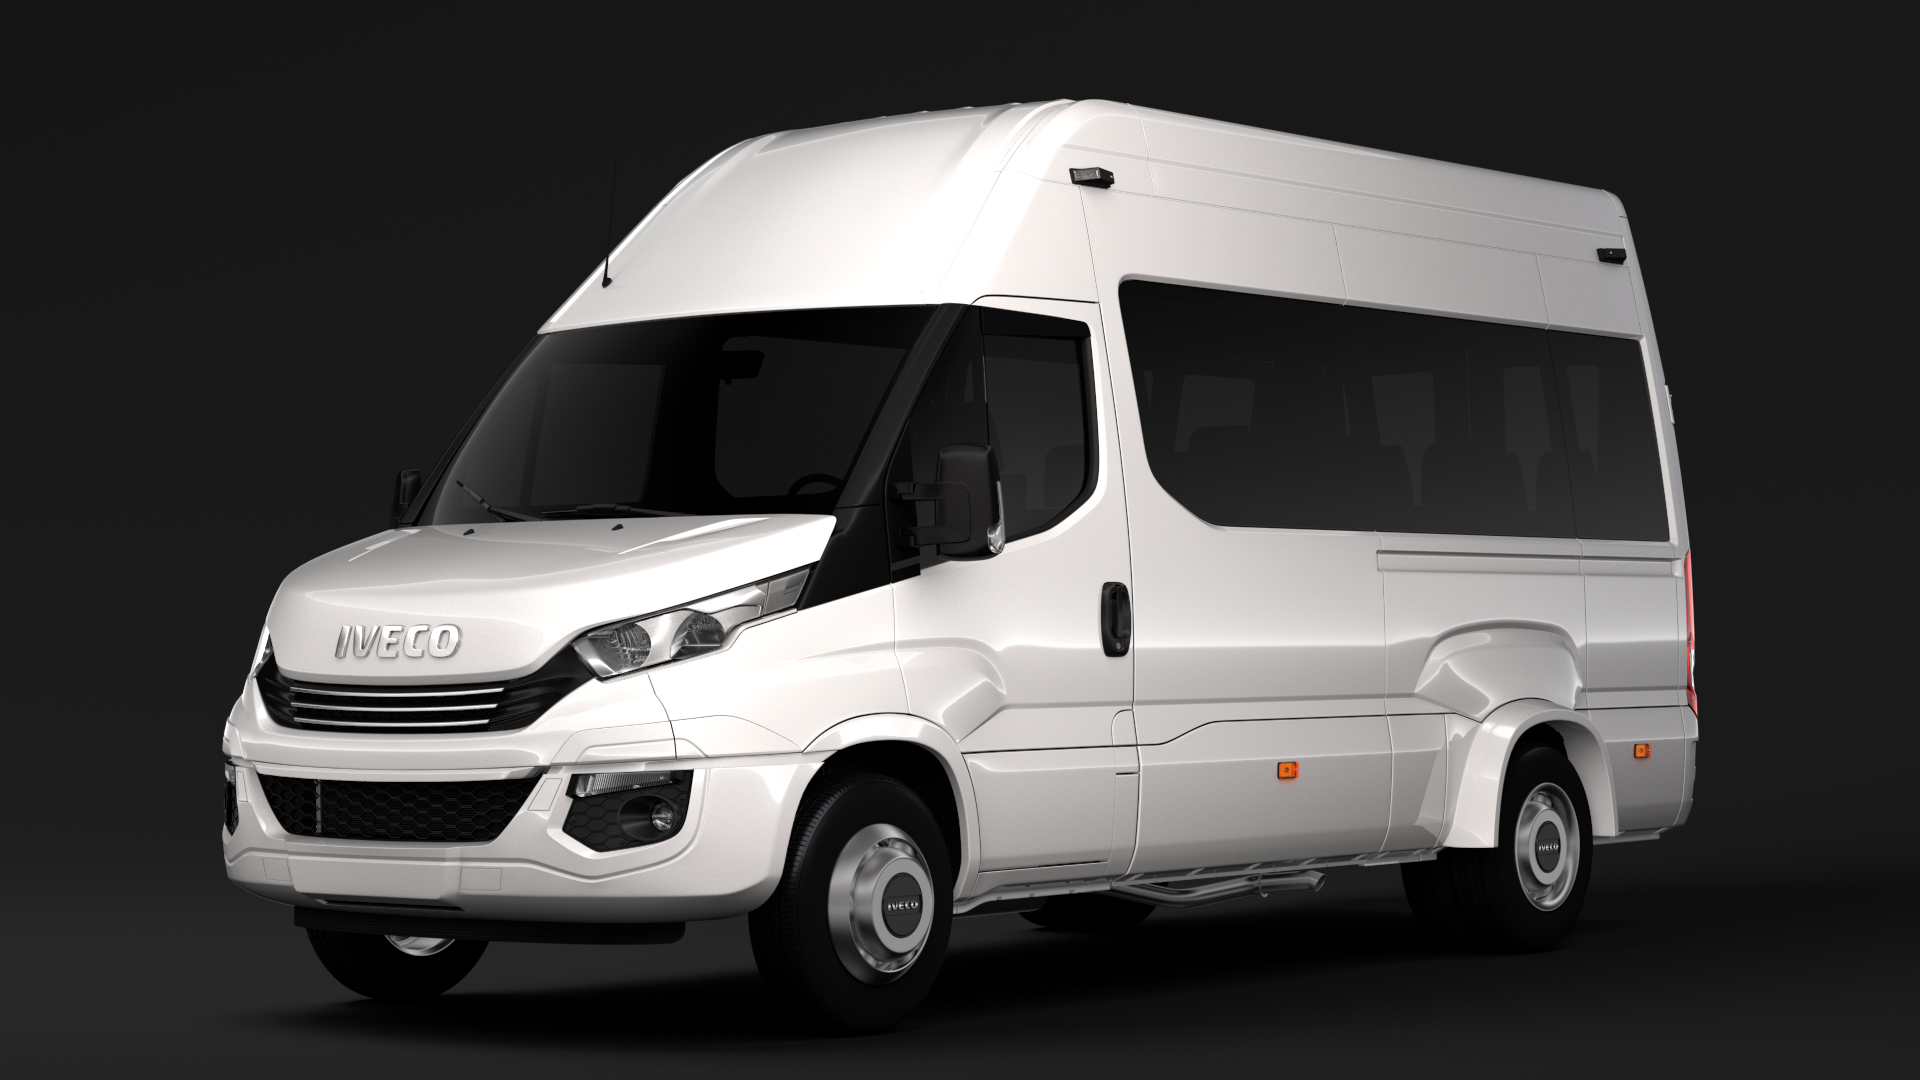 iveco daily minibus l3h3 2017 3d model max fbx c4d lwo ma mb hrc xsi obj 276140